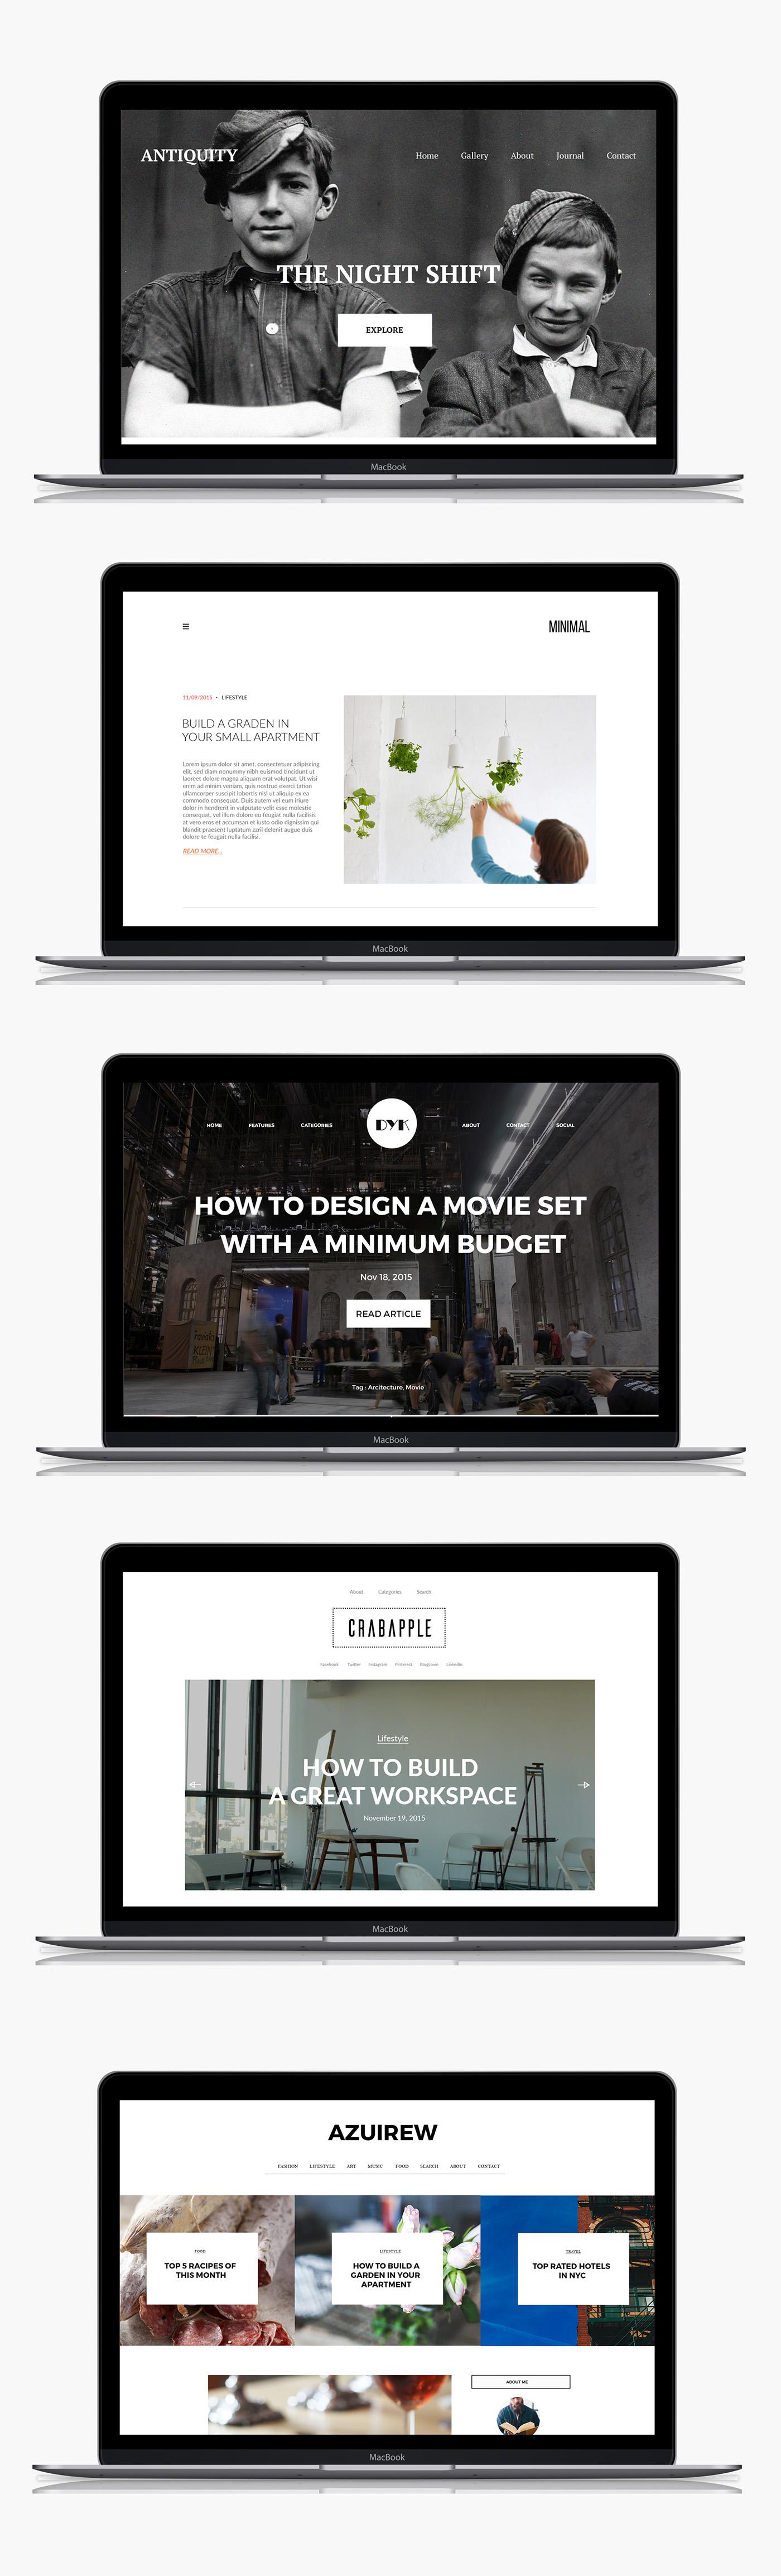 Blog,UI,kit,uikit,free,psd,bootstrap,grid,minimal,Webdesign,blogdesign